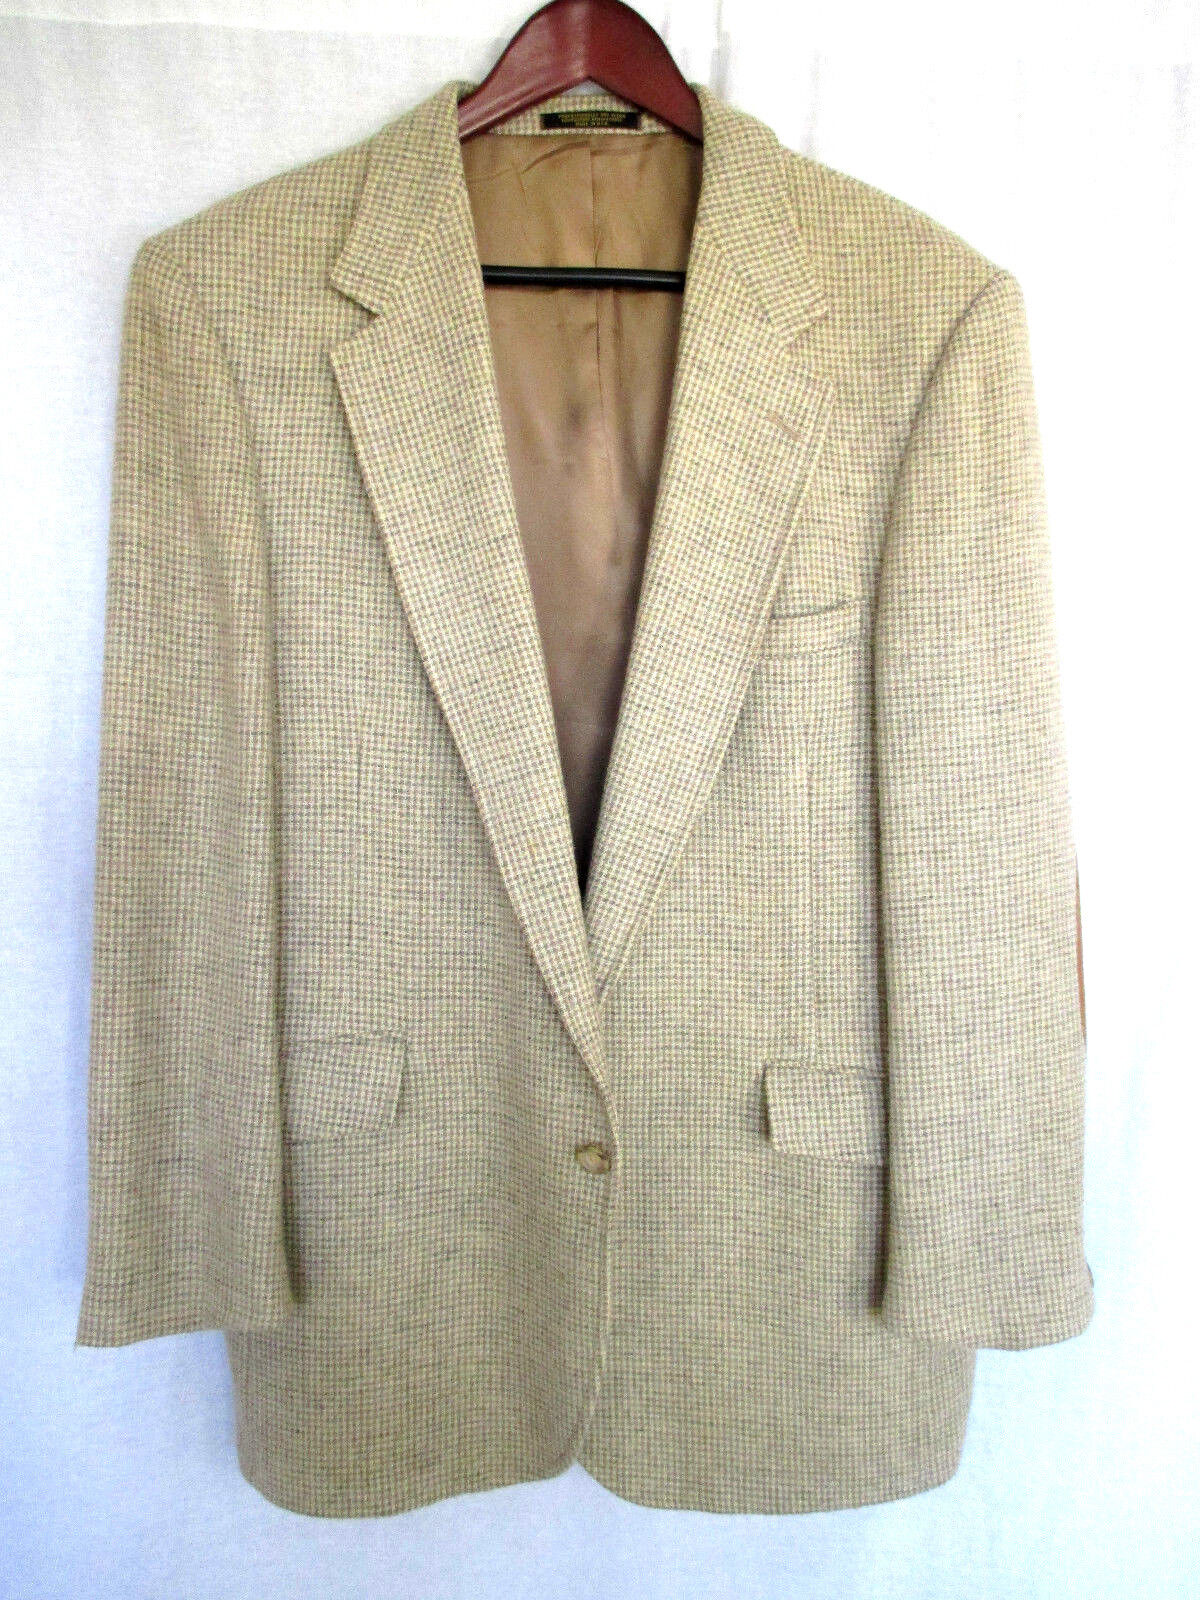 Evan Picone 44R  Herren Sport Coat Beige Houndstooth Vintage Chamois Elbow Patches